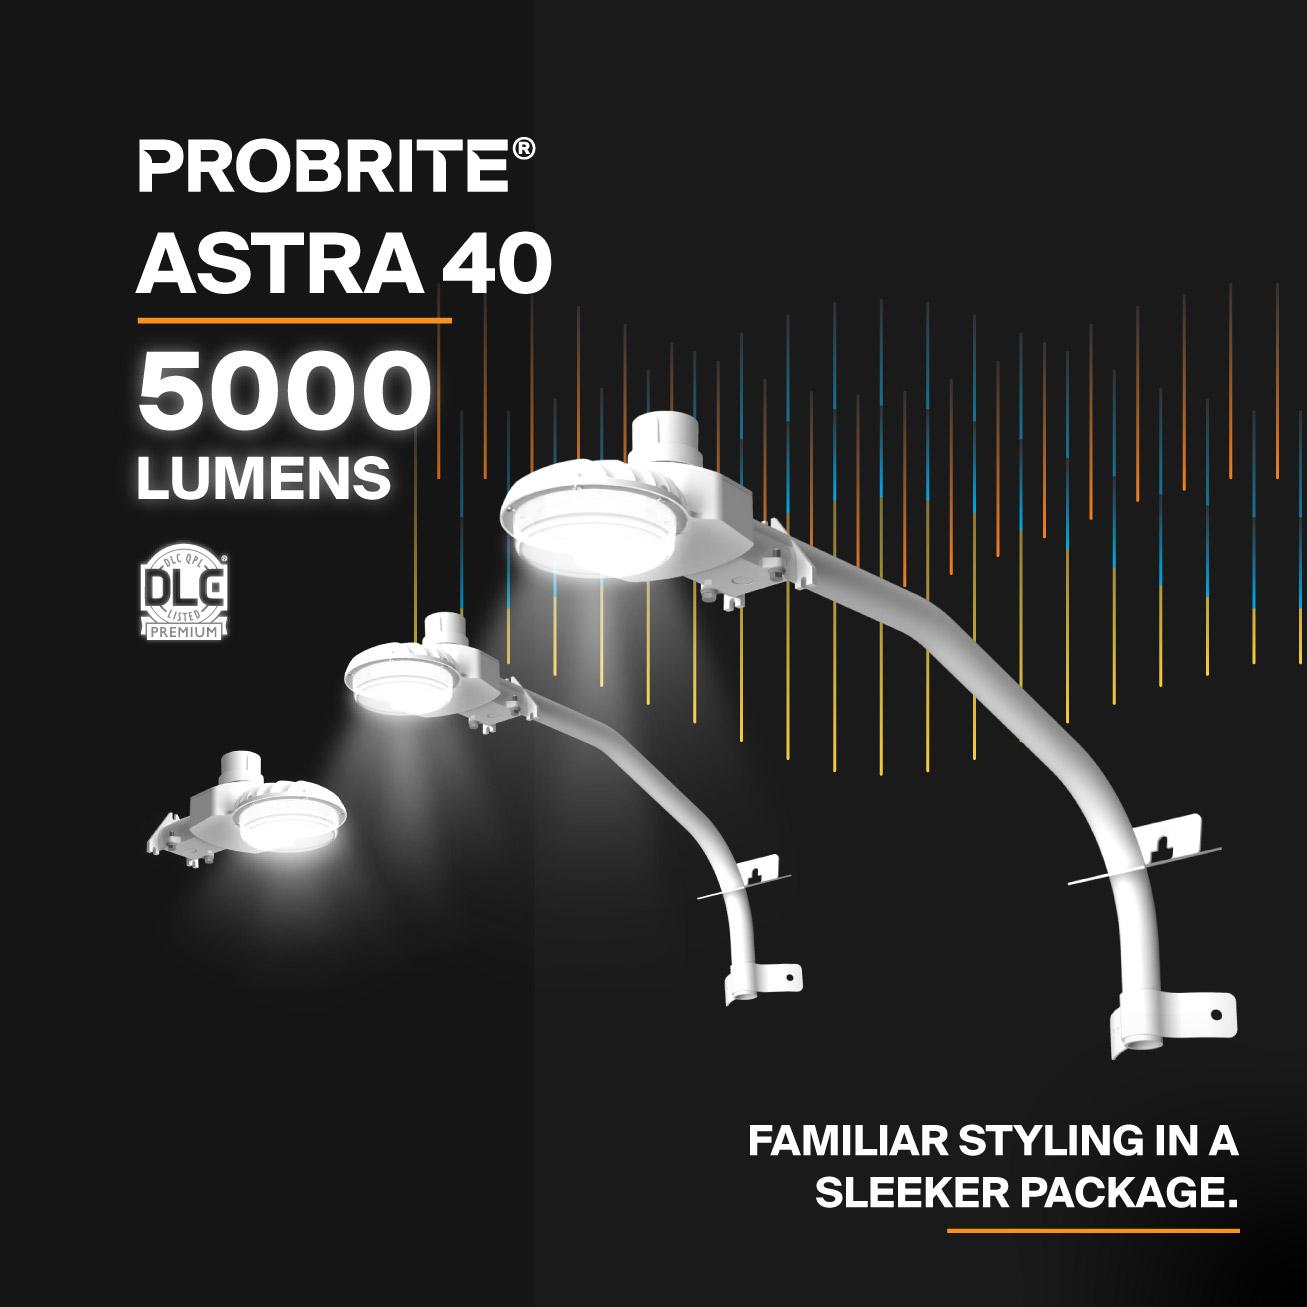 Probrite LED Area Light Astra40 Sleek and Familiar Design